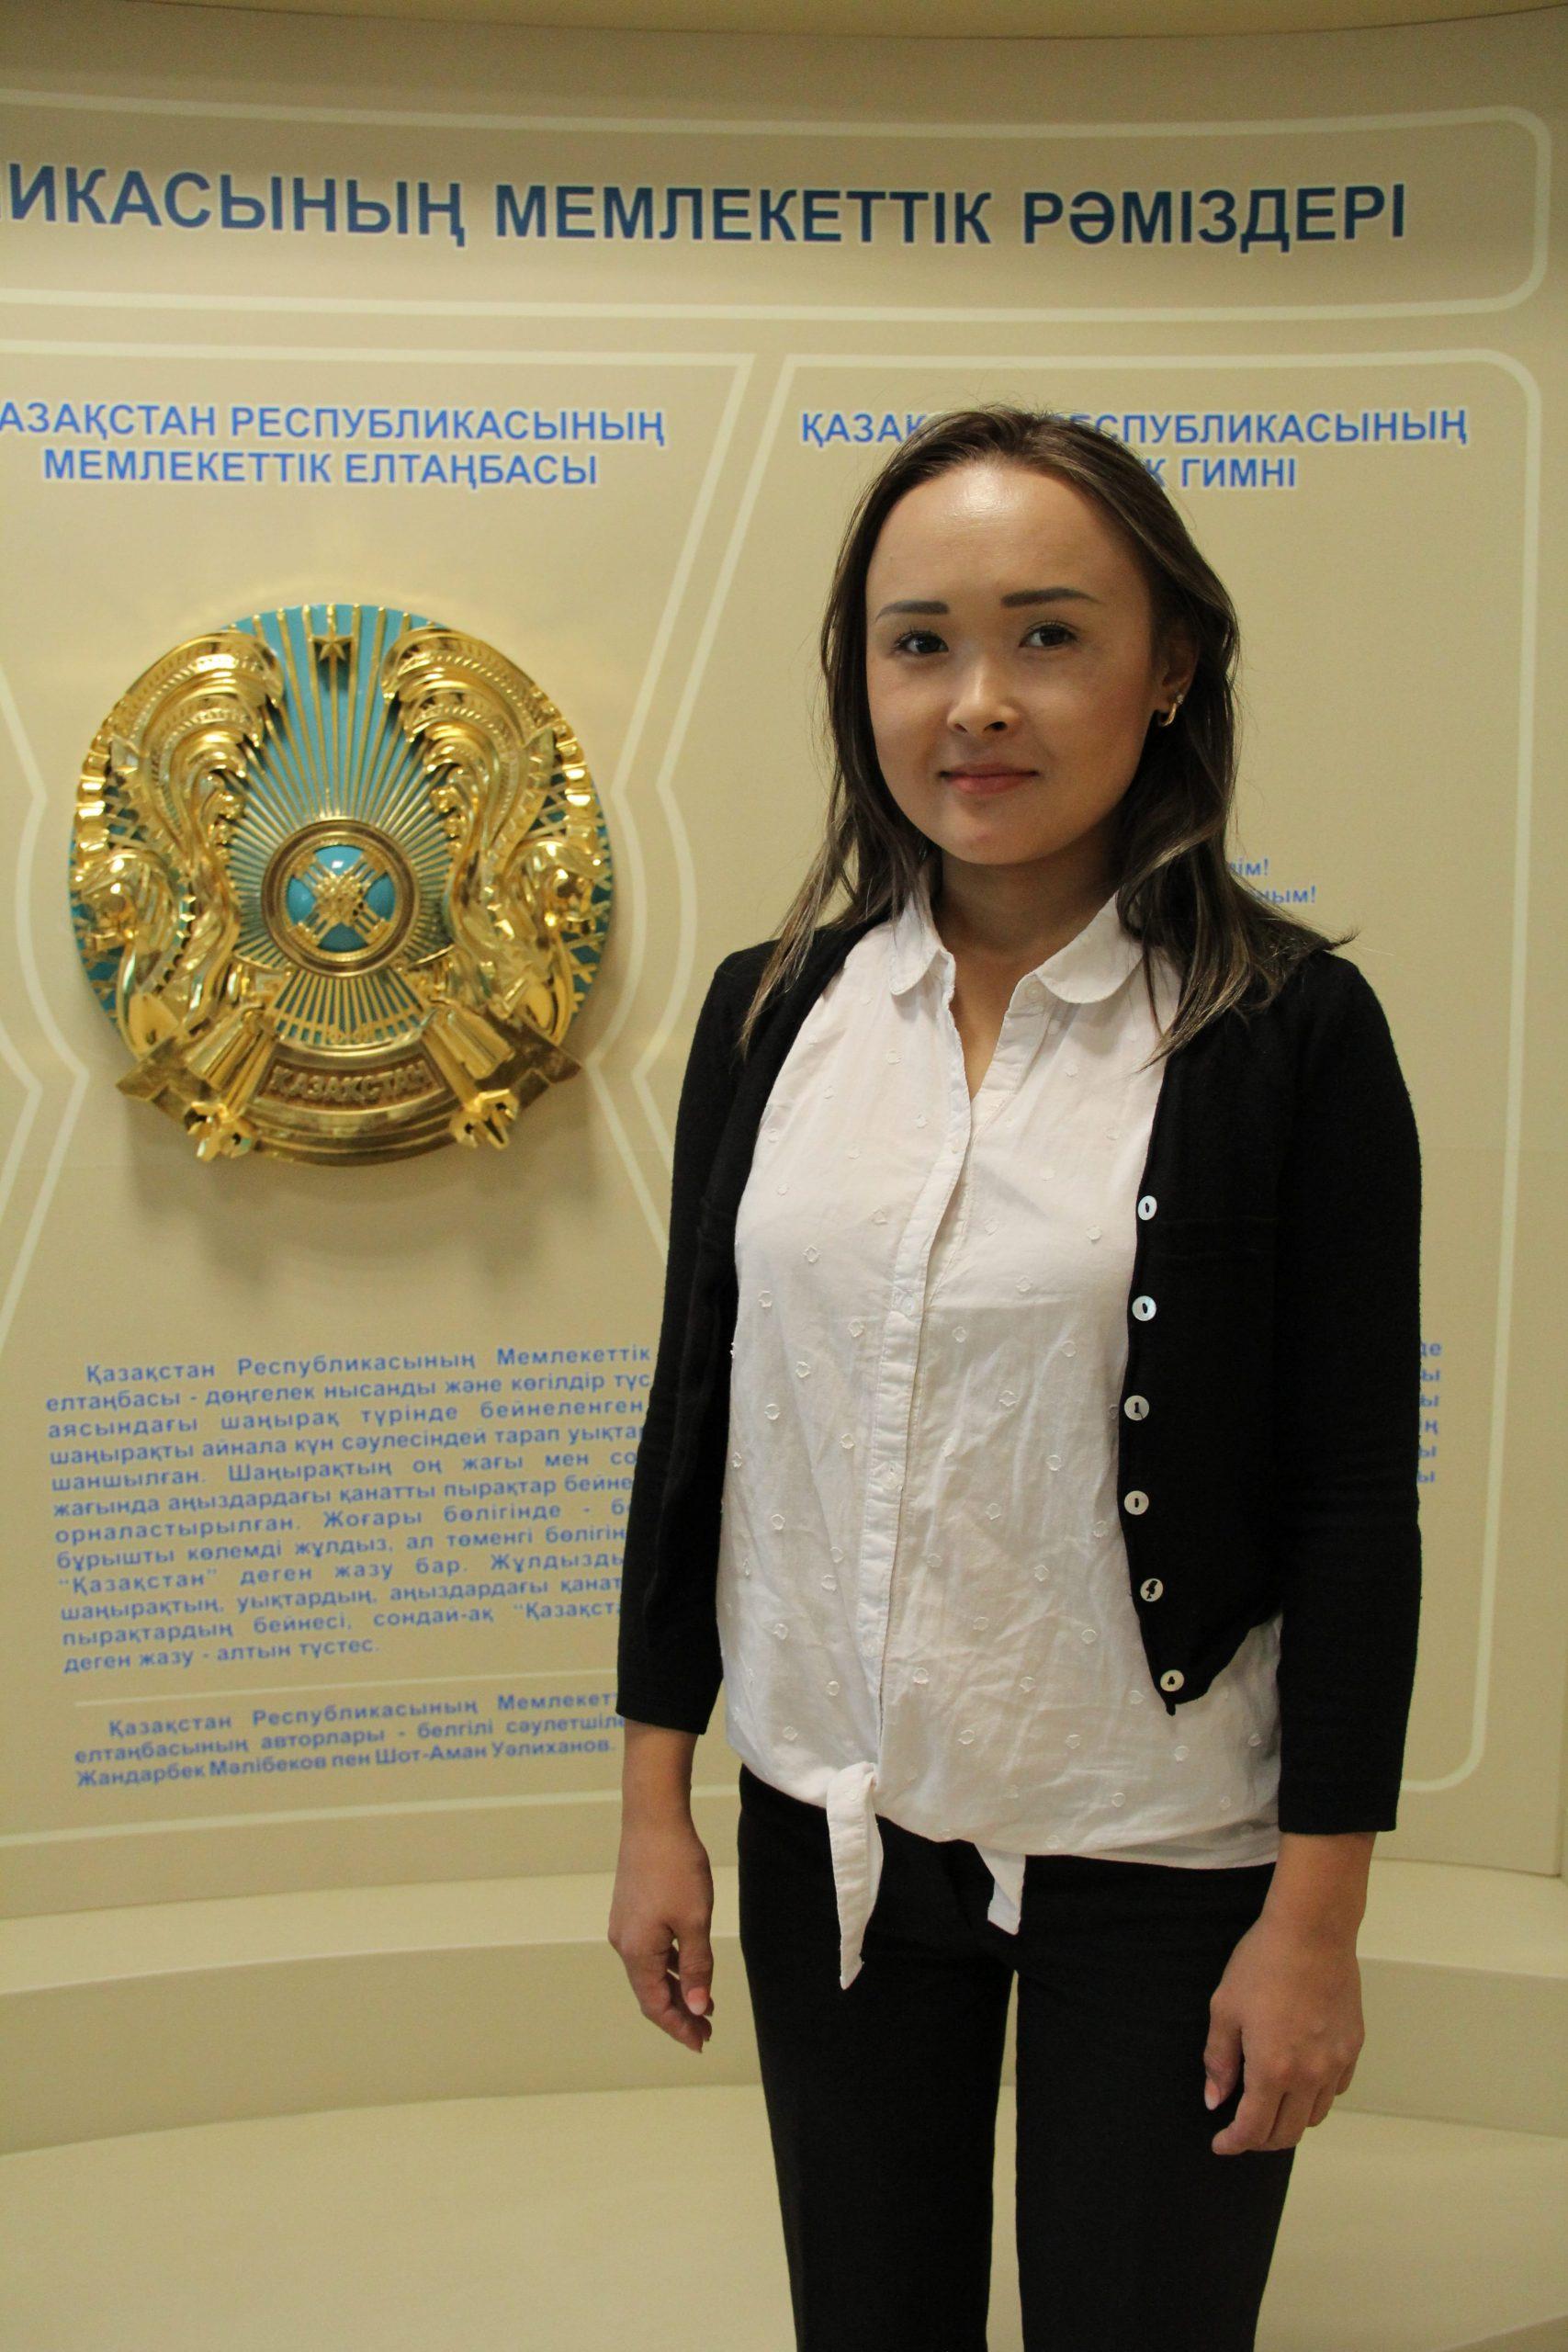 Абдрашитова Жансая Ермековна